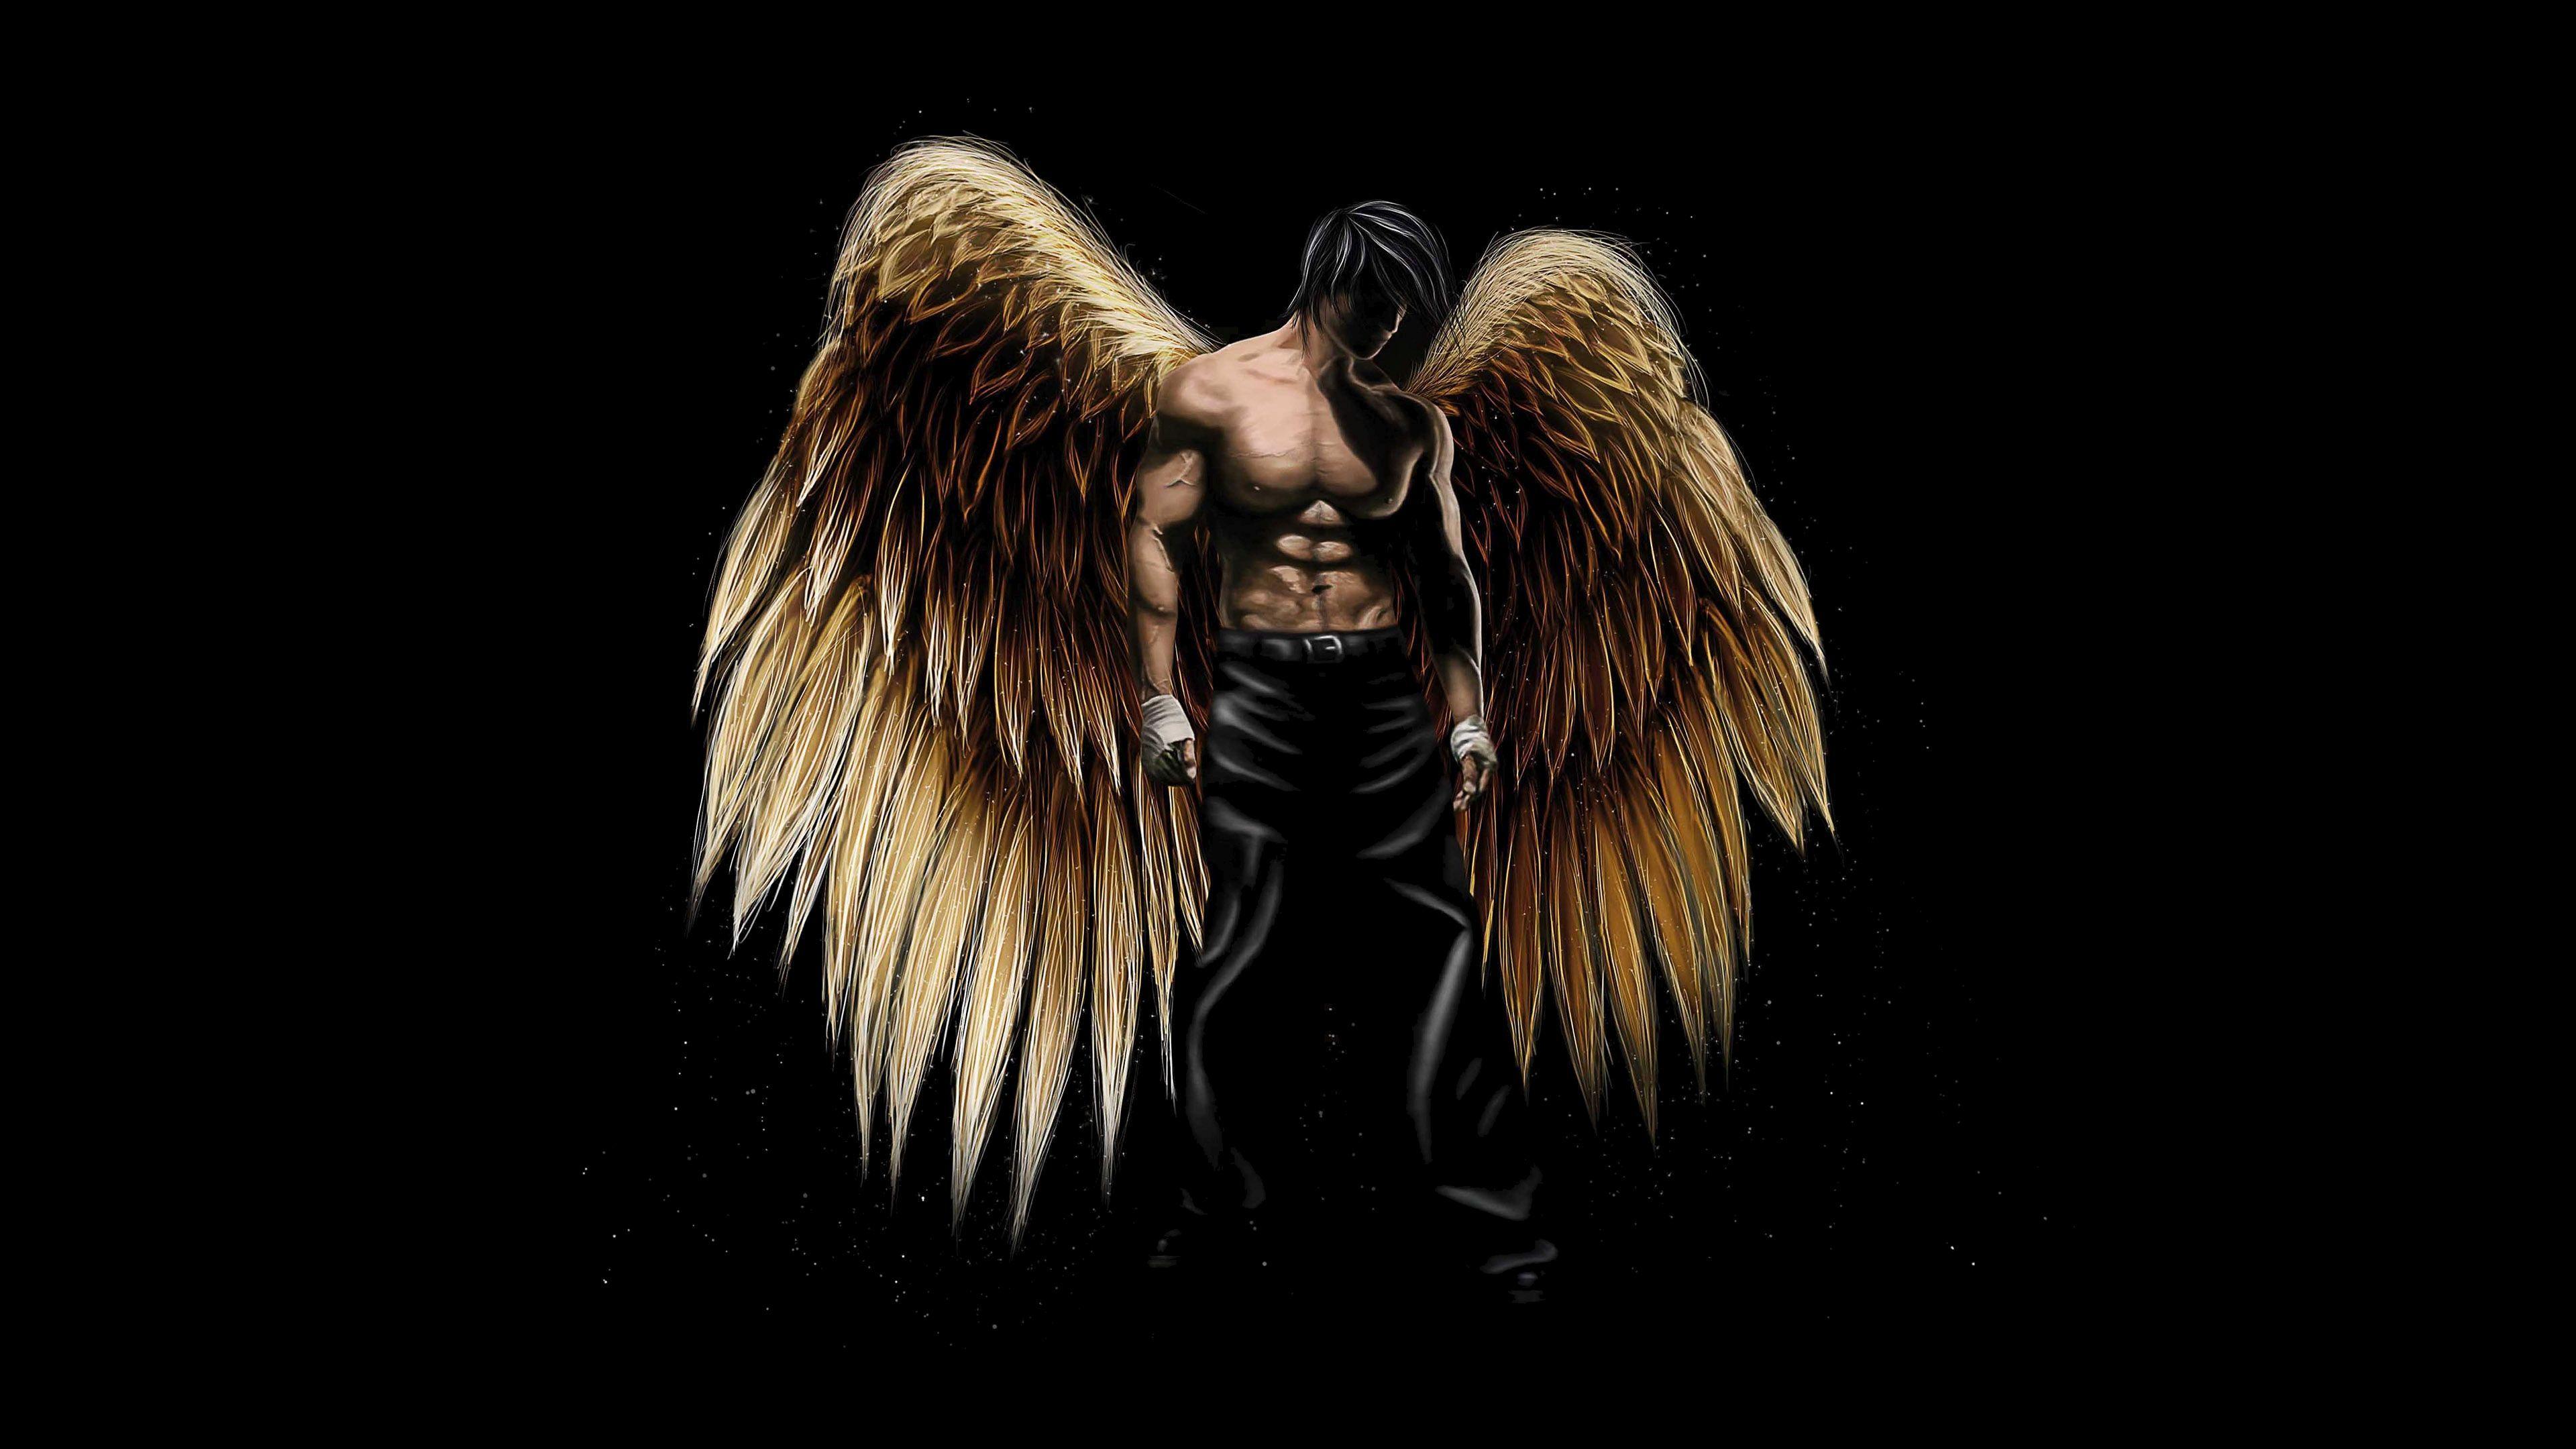 Black Angel Wallpapers 79 Wallpapers Hd Wallpapers   Uhd Angel 3840x2160